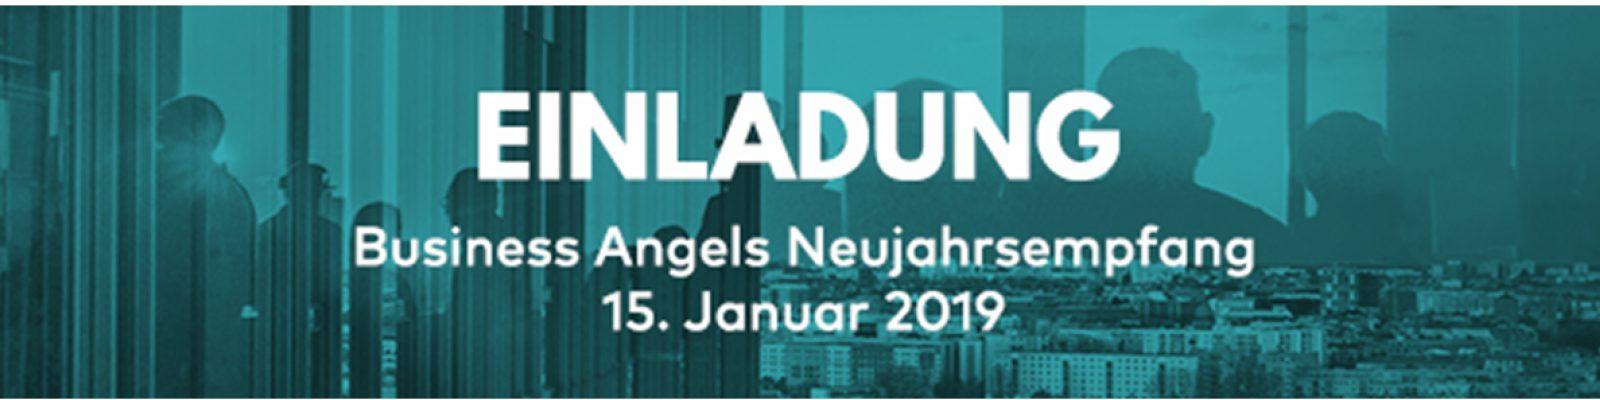 Business Angels Neujahrsempfang Header